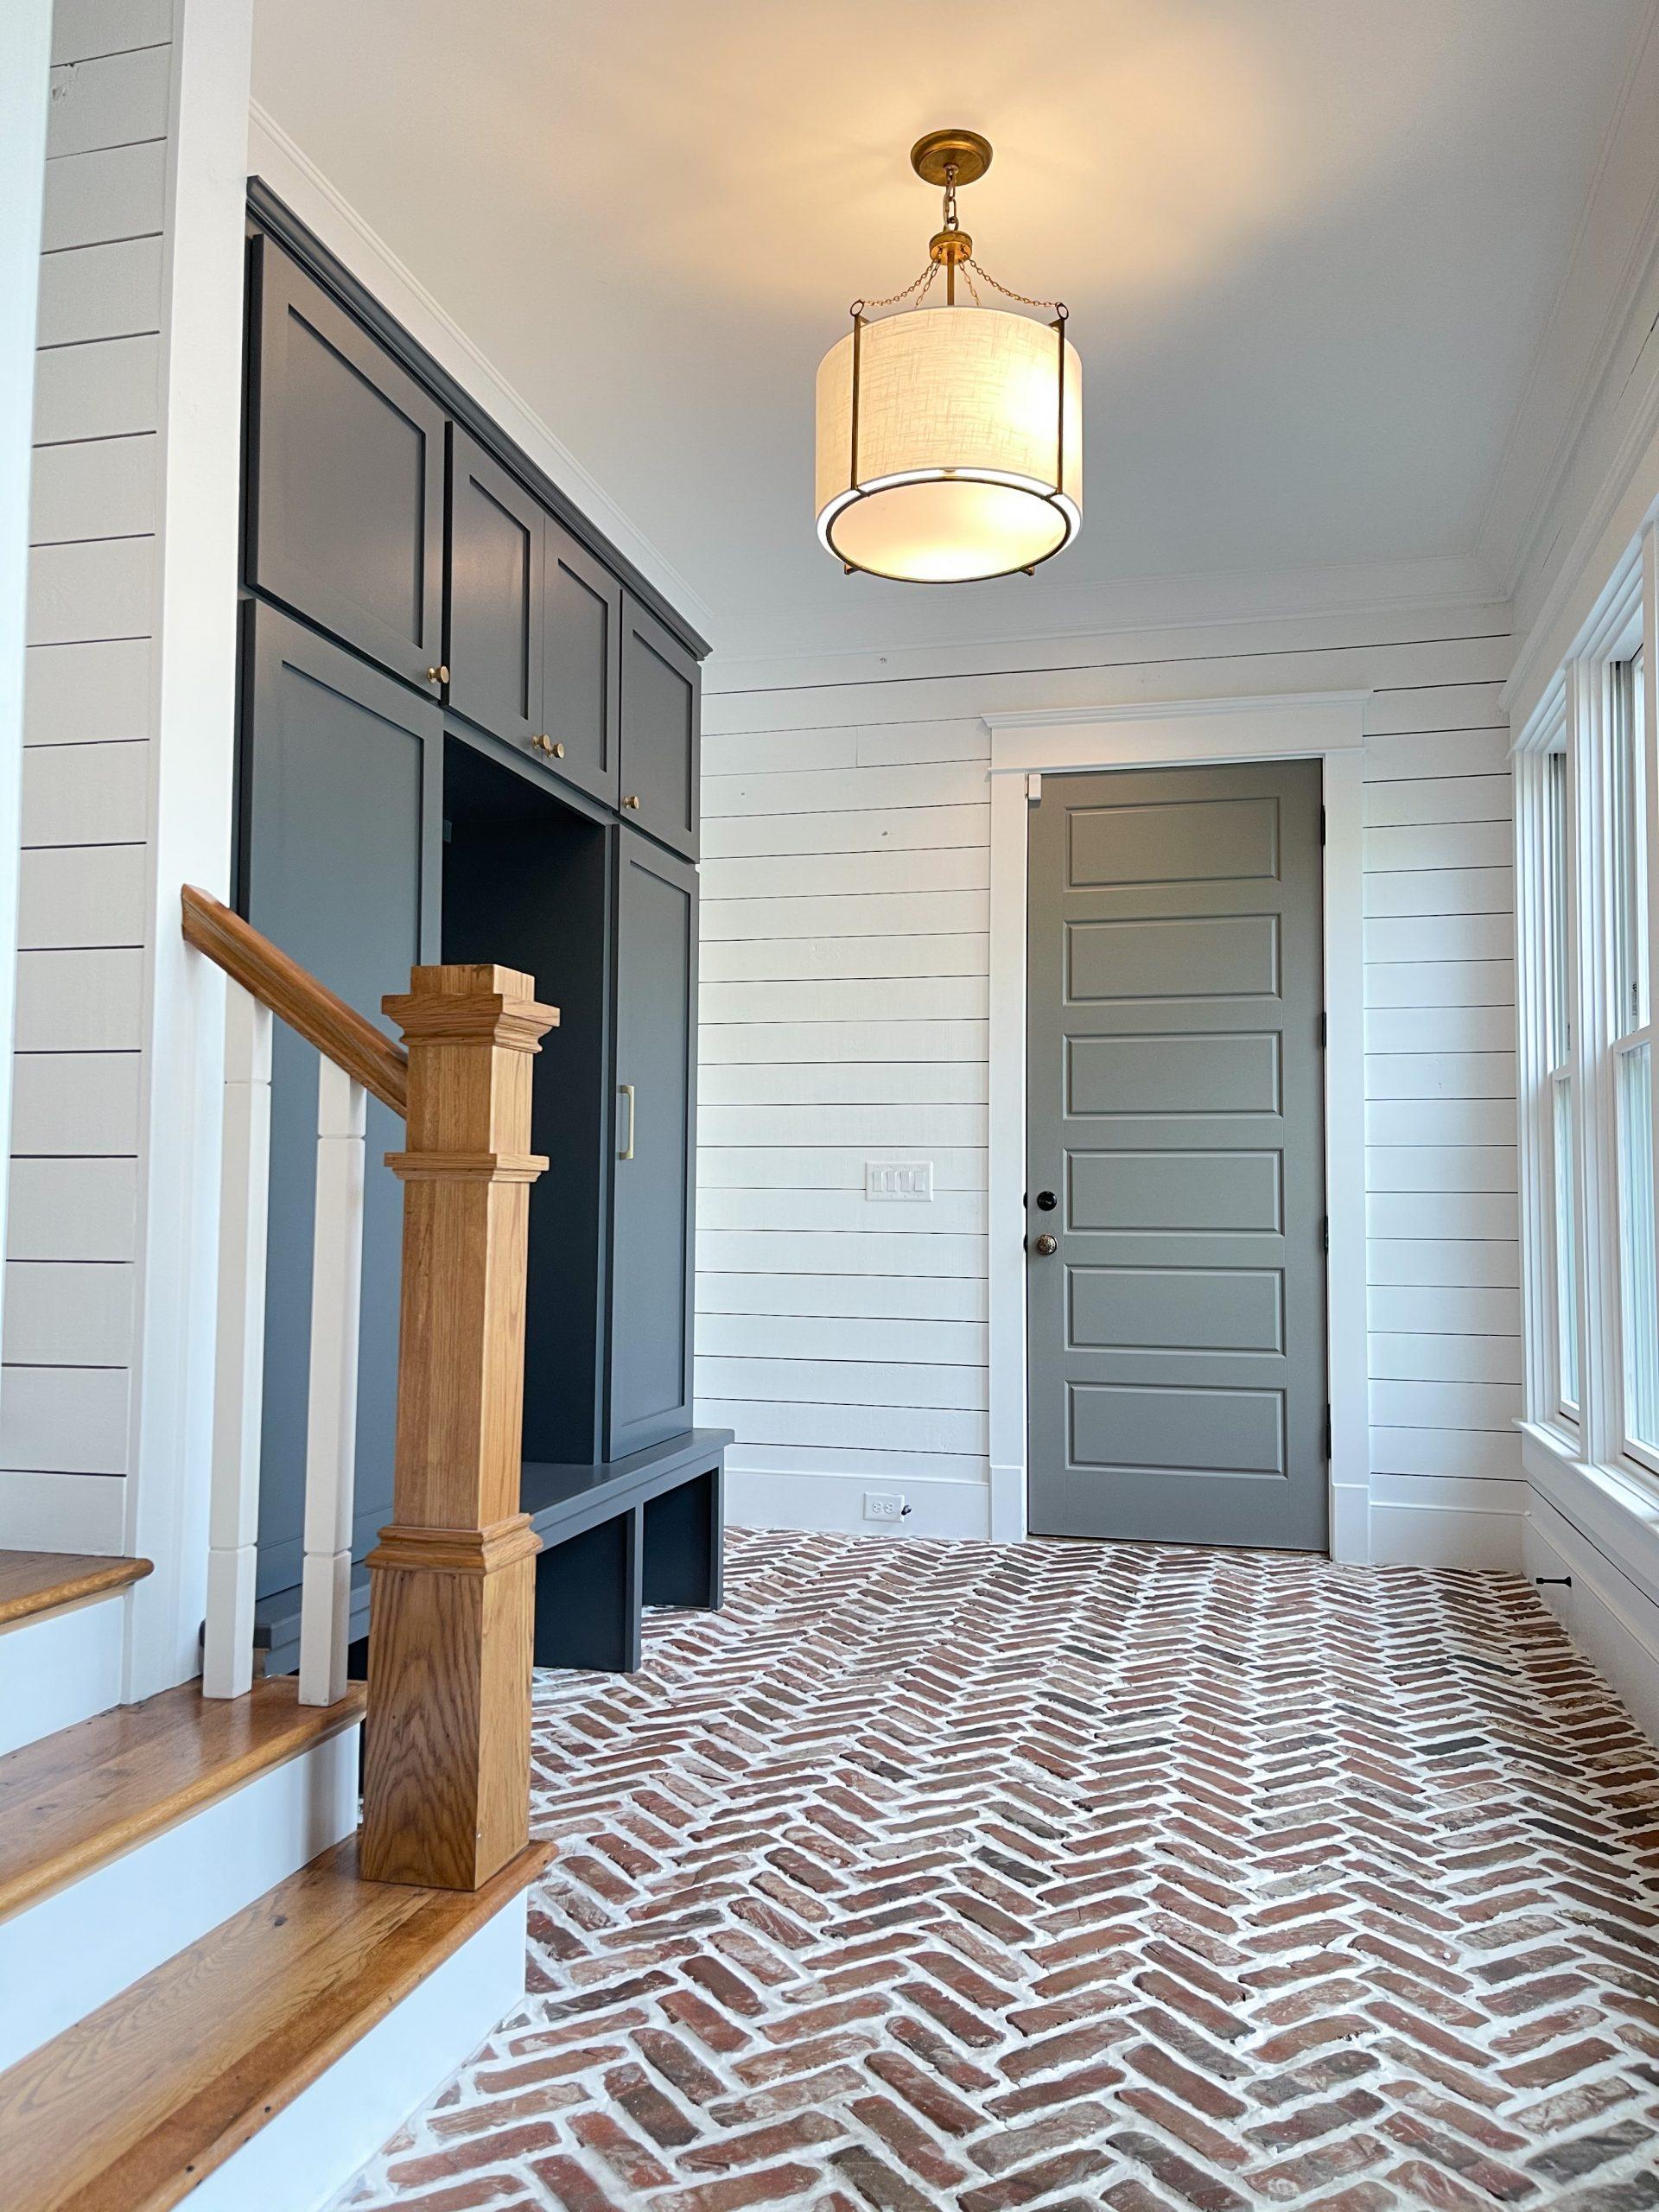 nashville, tn herringbone brick floors navy built-in cabinets white shiplap